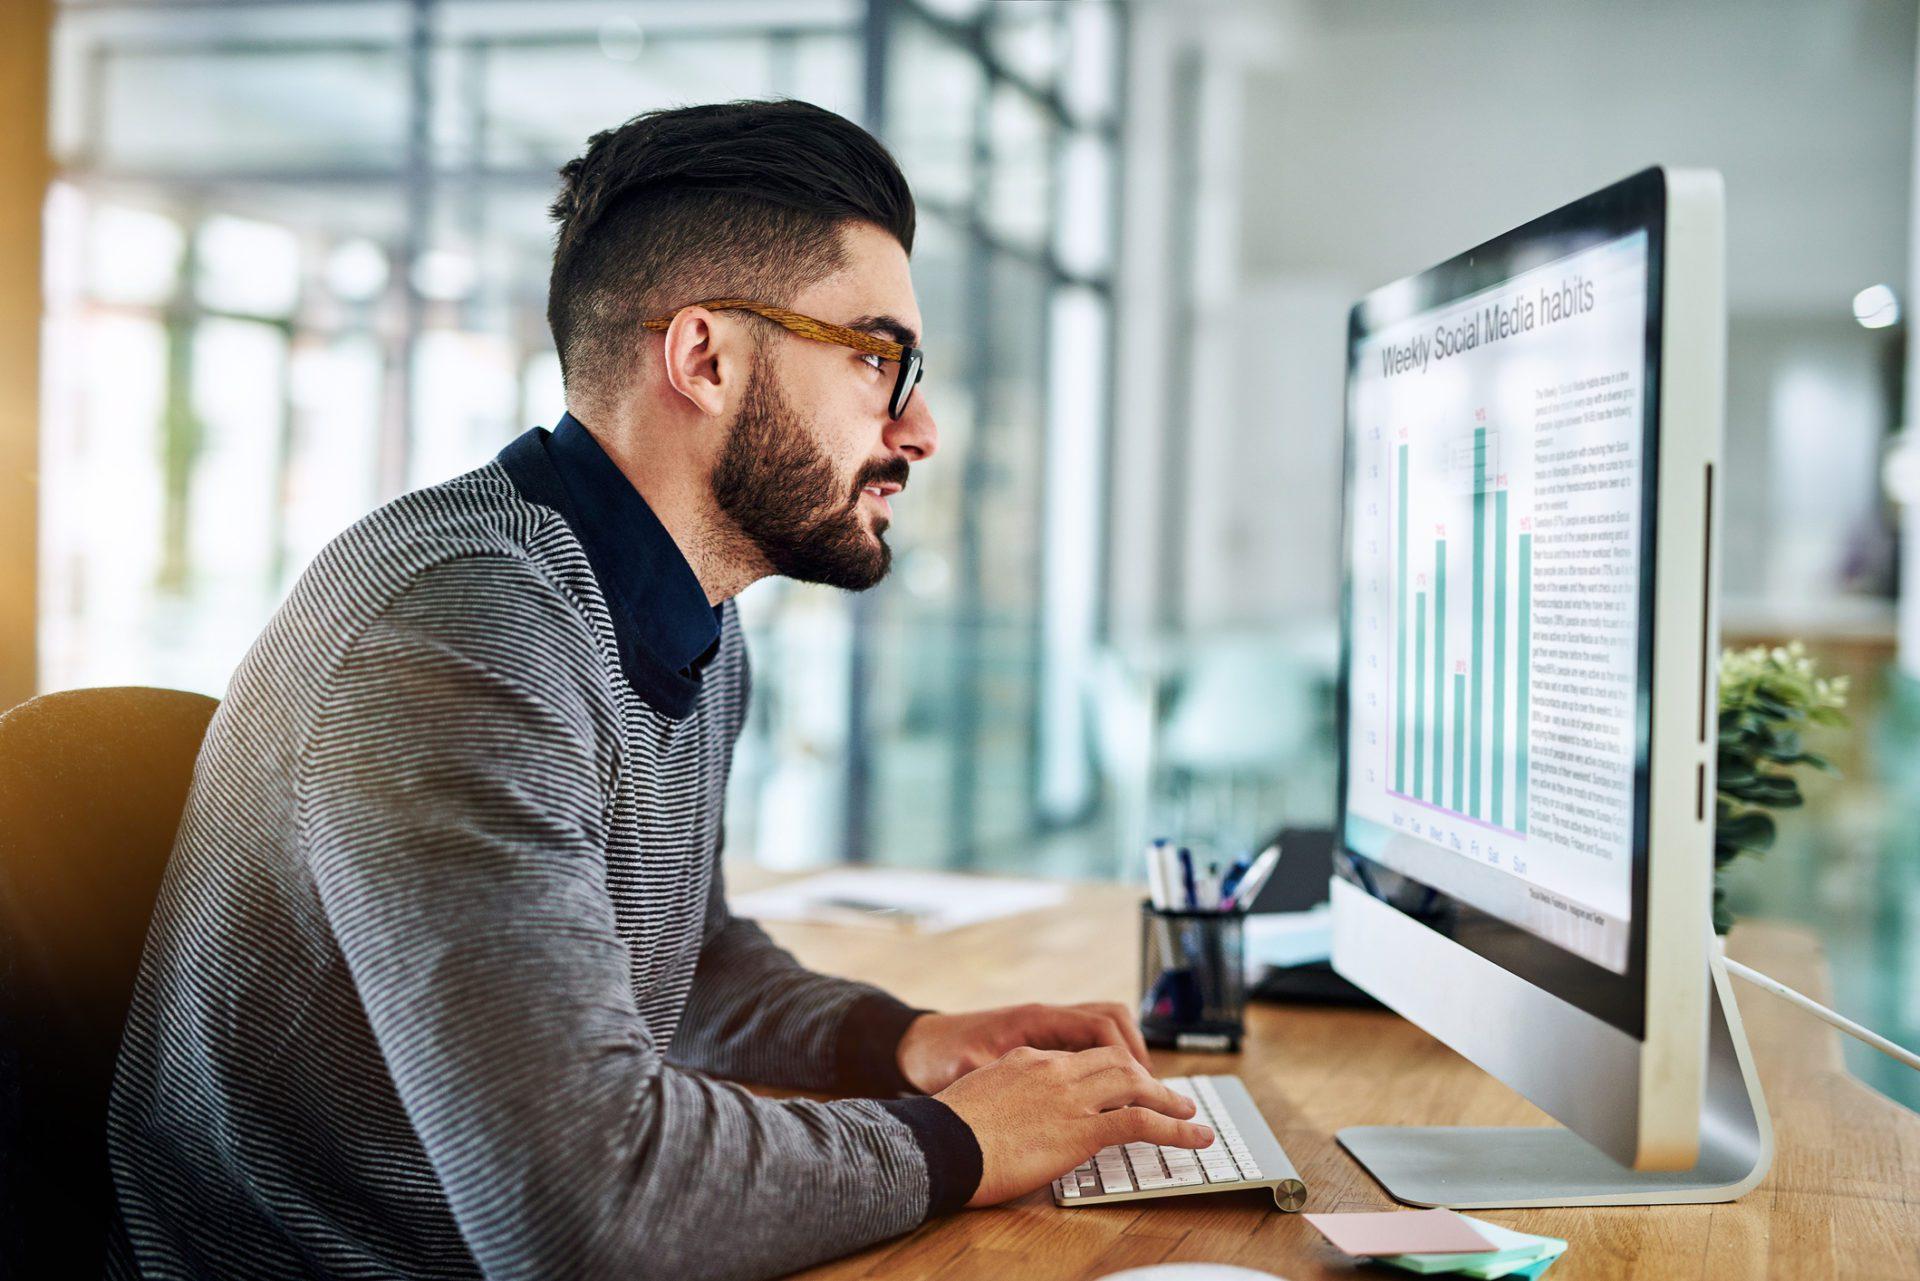 man viewing market research report on desktop exemplifies data-driven culture